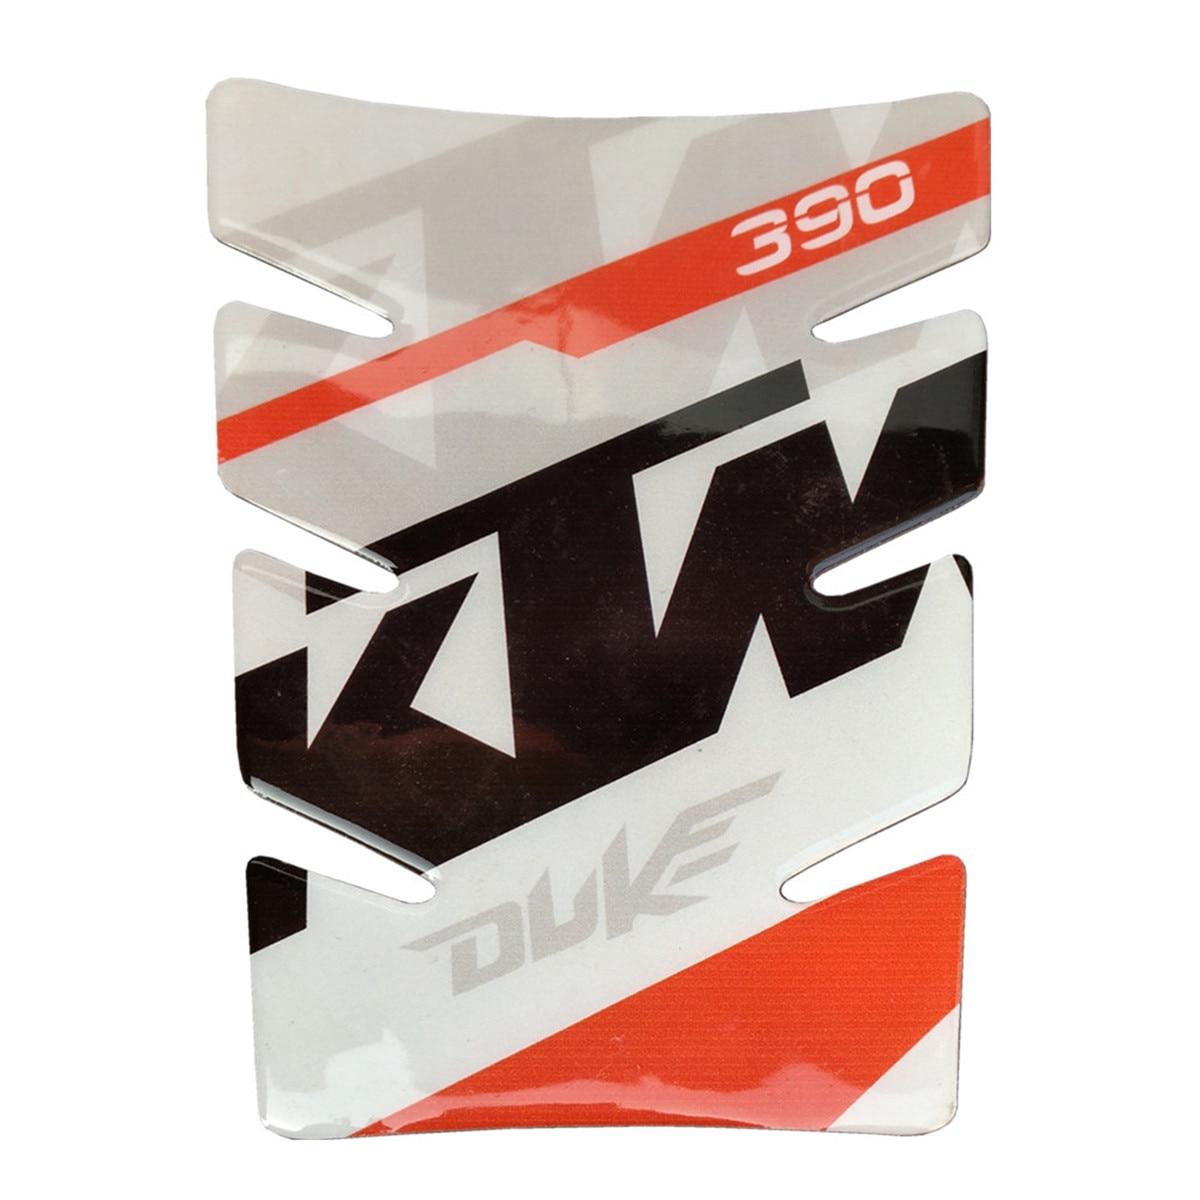 Мотоцикл высокого качества для KTM Duke 390 Танк Pad стикер 3D наклейка эмблема 2018 2017 Tankpads части двигателя защита мотоцикла